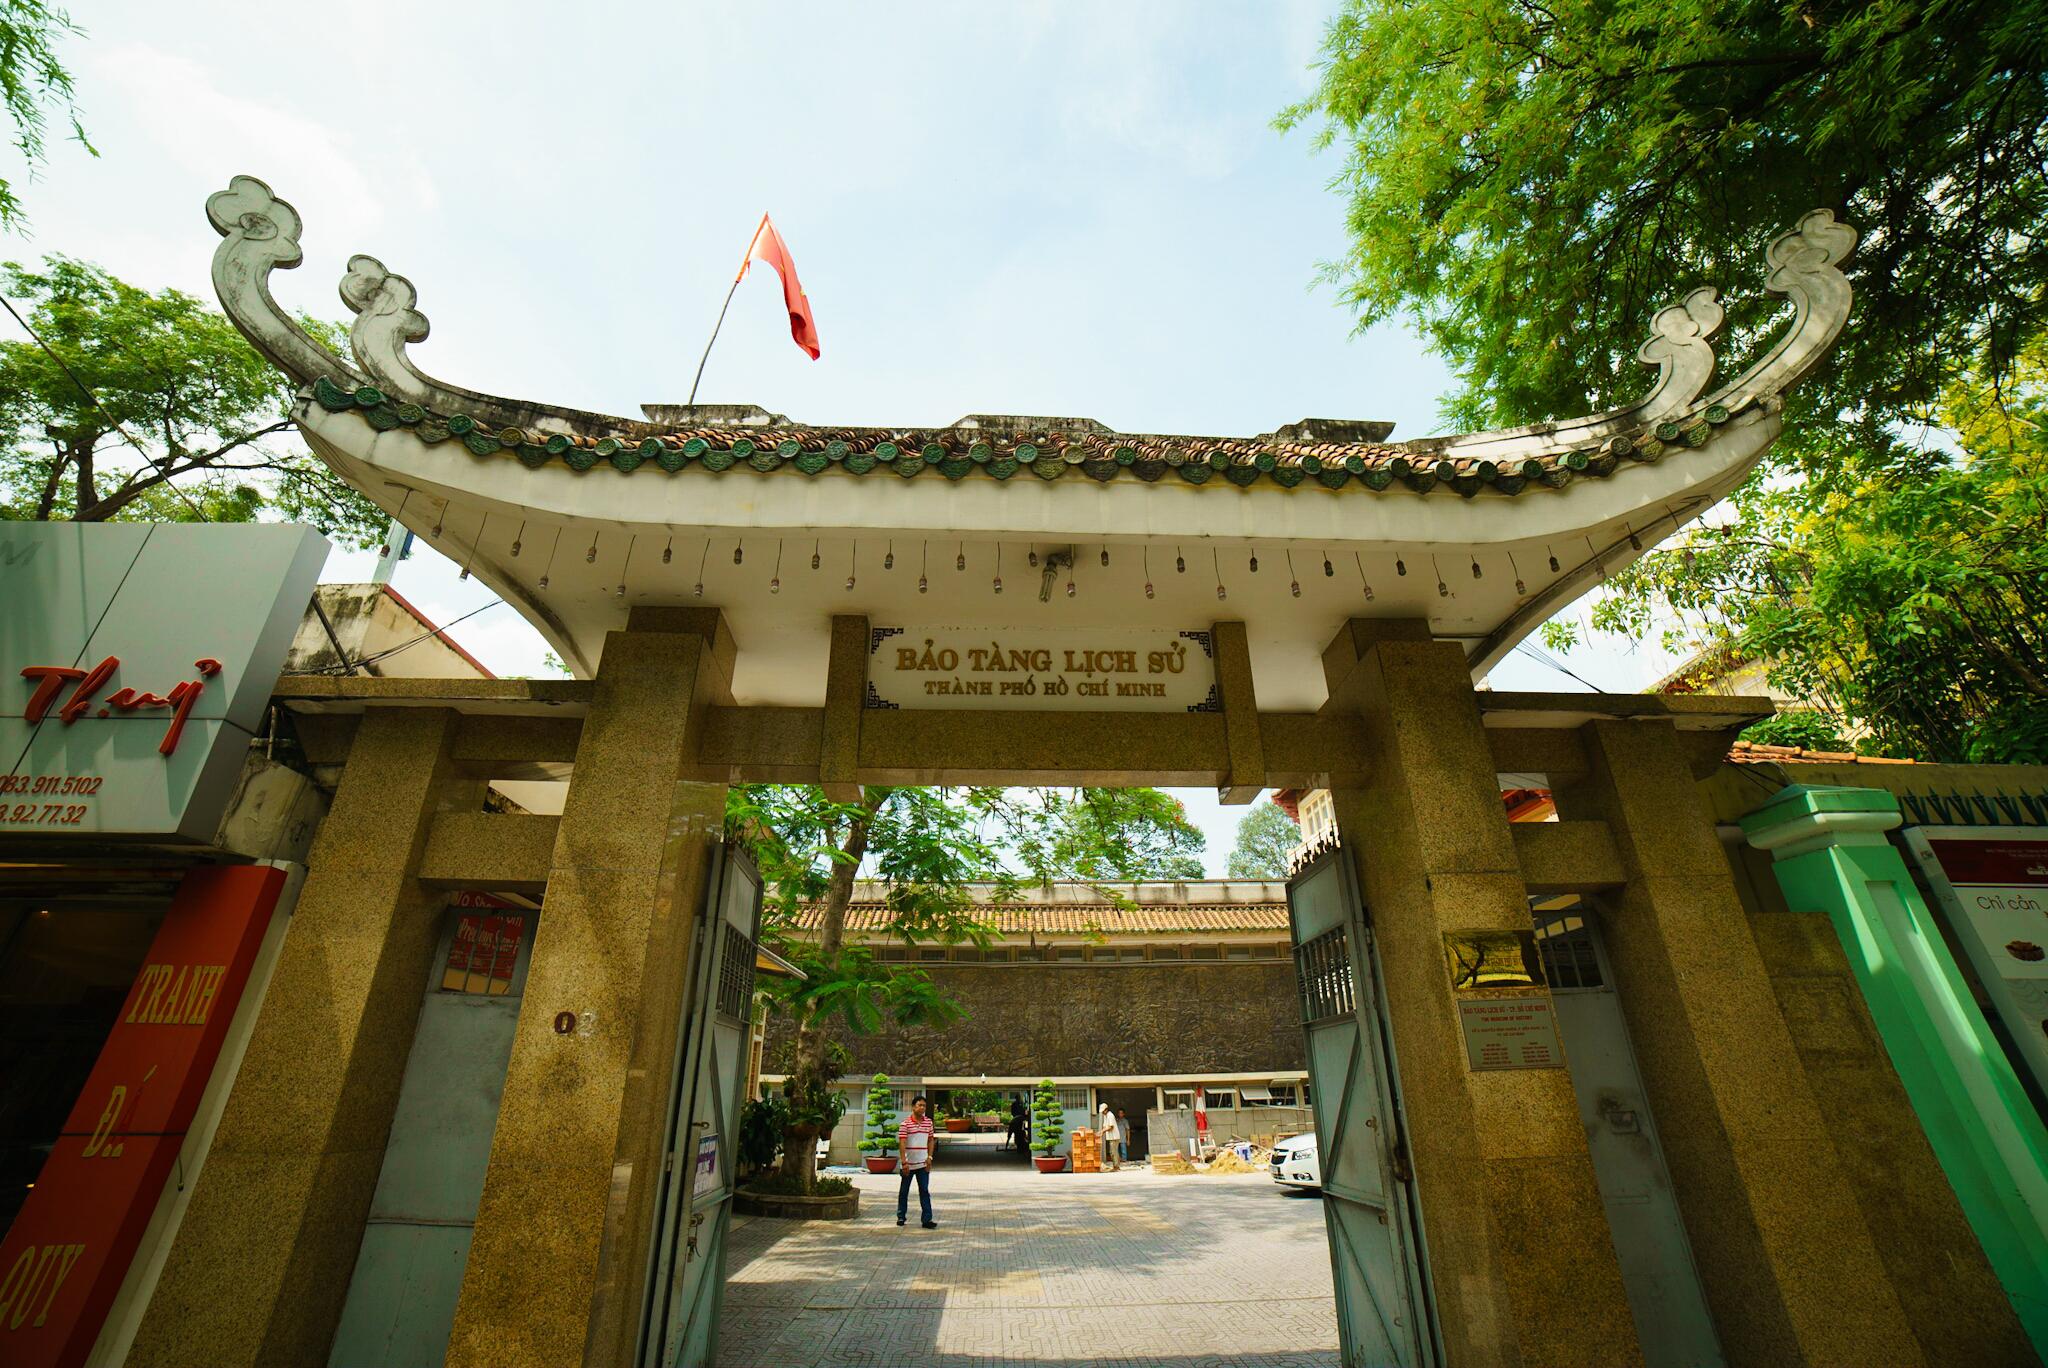 Vietnamese history museum